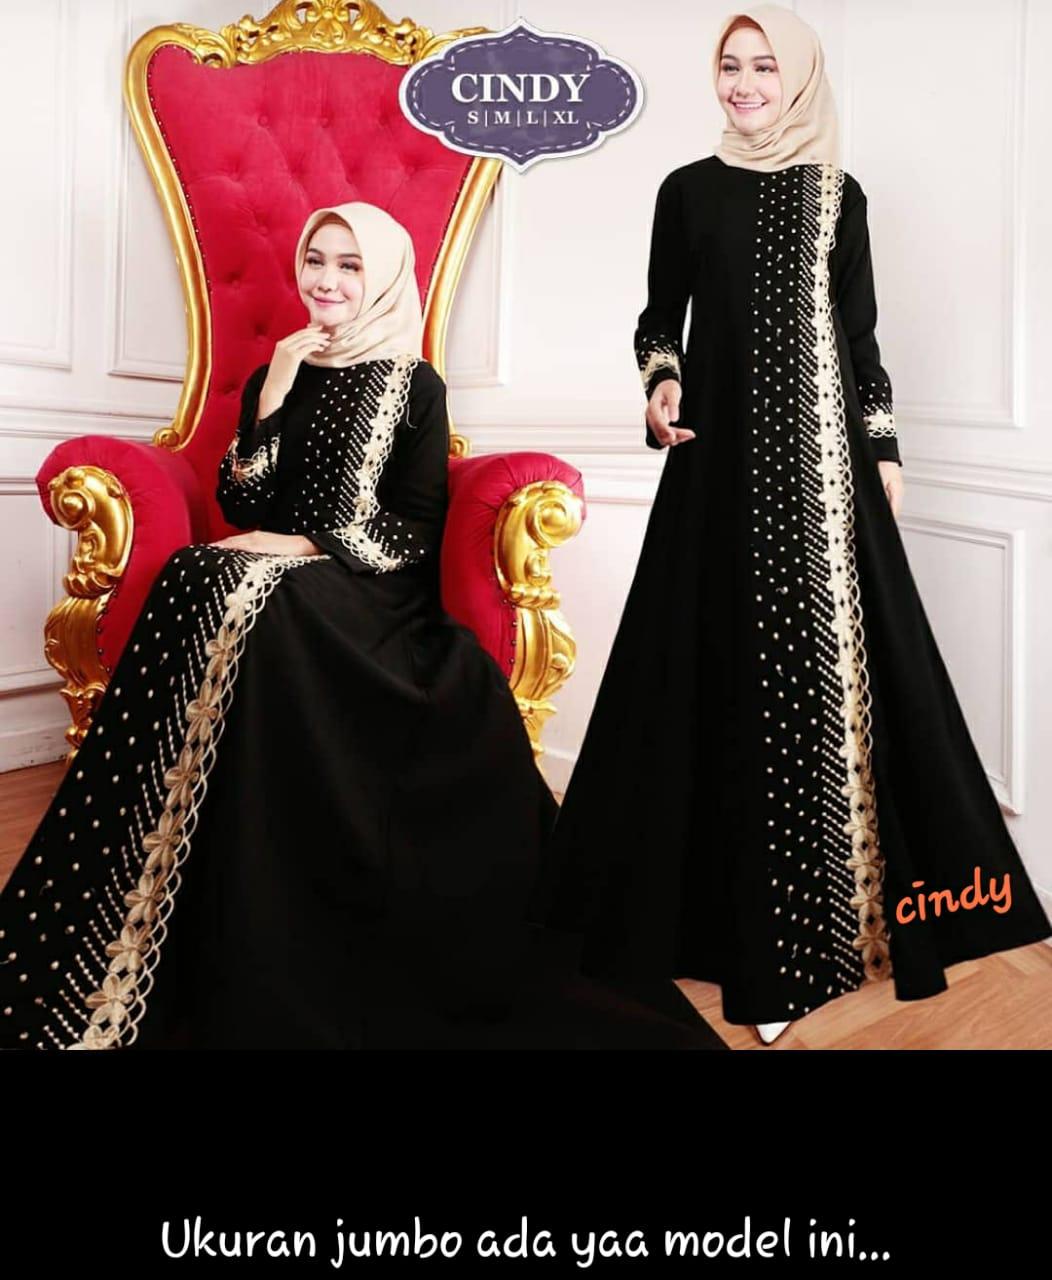 Gamis Abaya Arab Hitam Jumbo  Gamis Abaya Turkey Jumbo  Gamis Hitam   Gamis Bordir  Pakaian Wanita // Busana Muslim // Pakaian Muslim